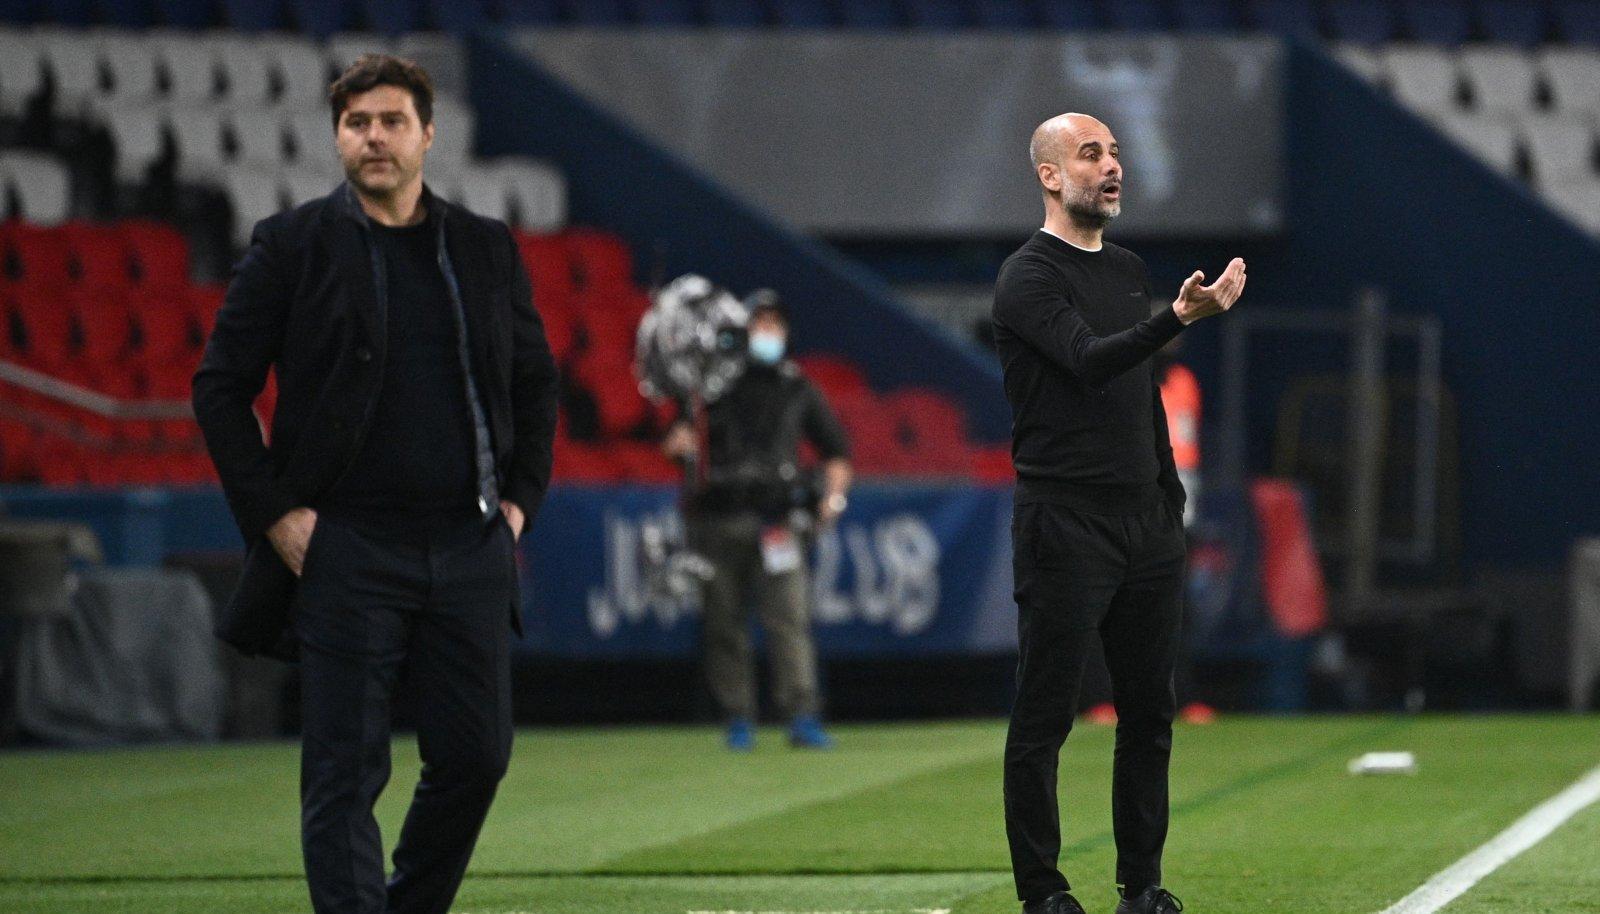 Mauricio Pochettino ja Pep Guardiola